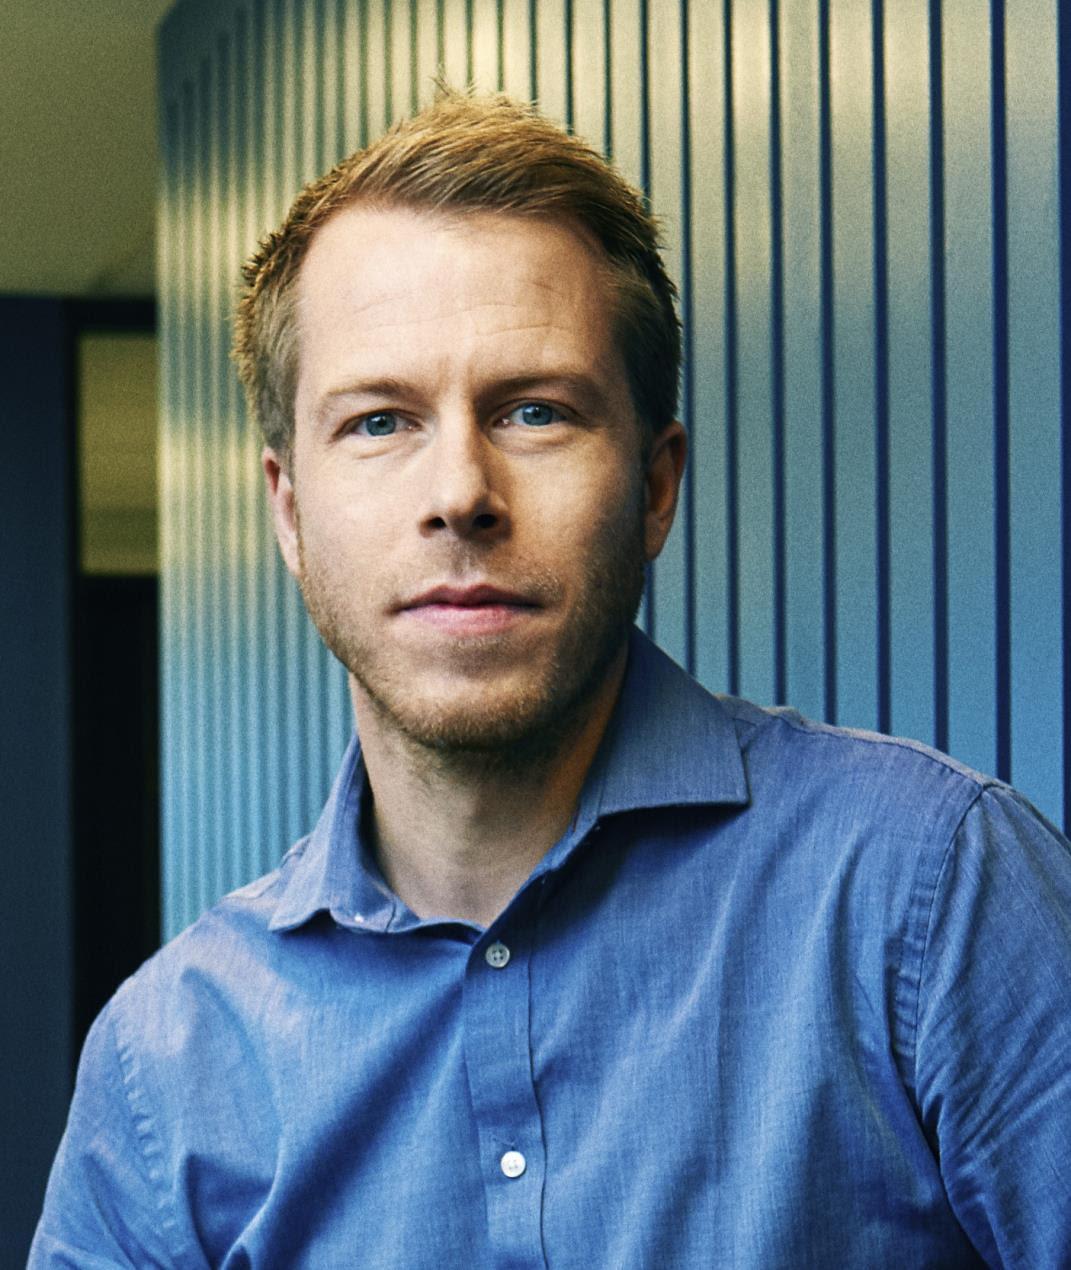 Xeneta CEO Patrik Berglund